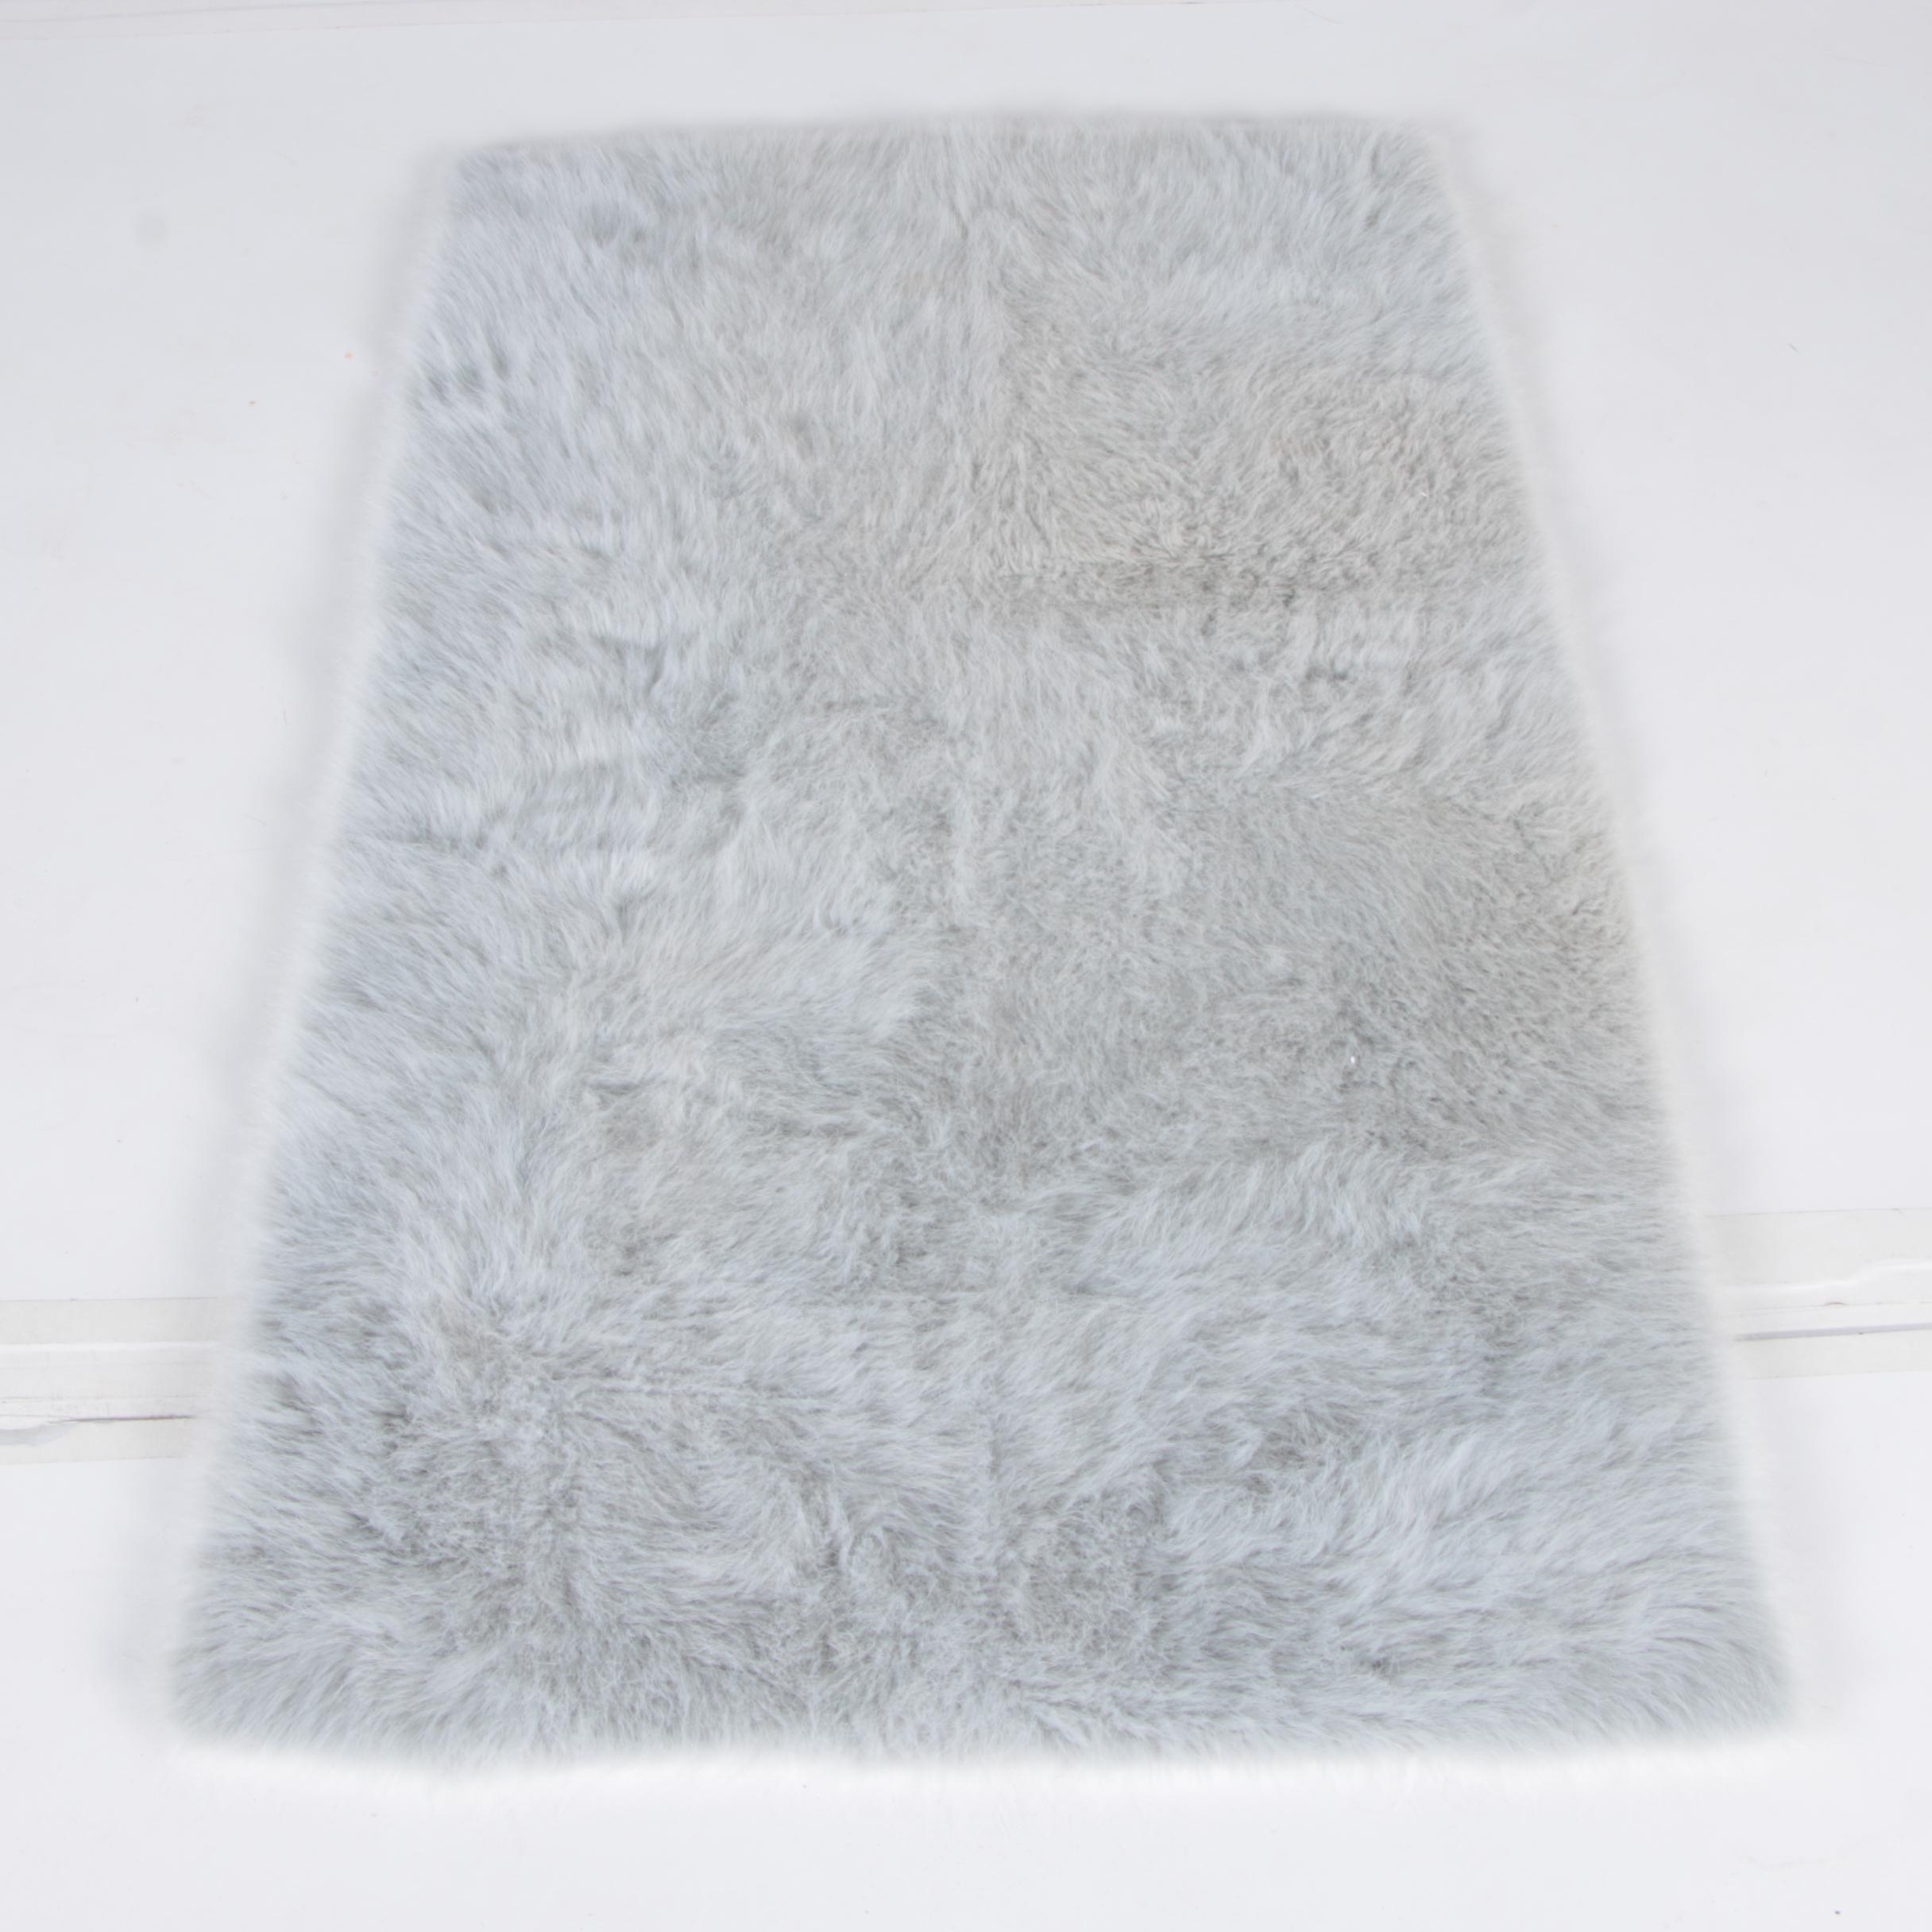 Dynamic Rugs Faux Fur Area Rug